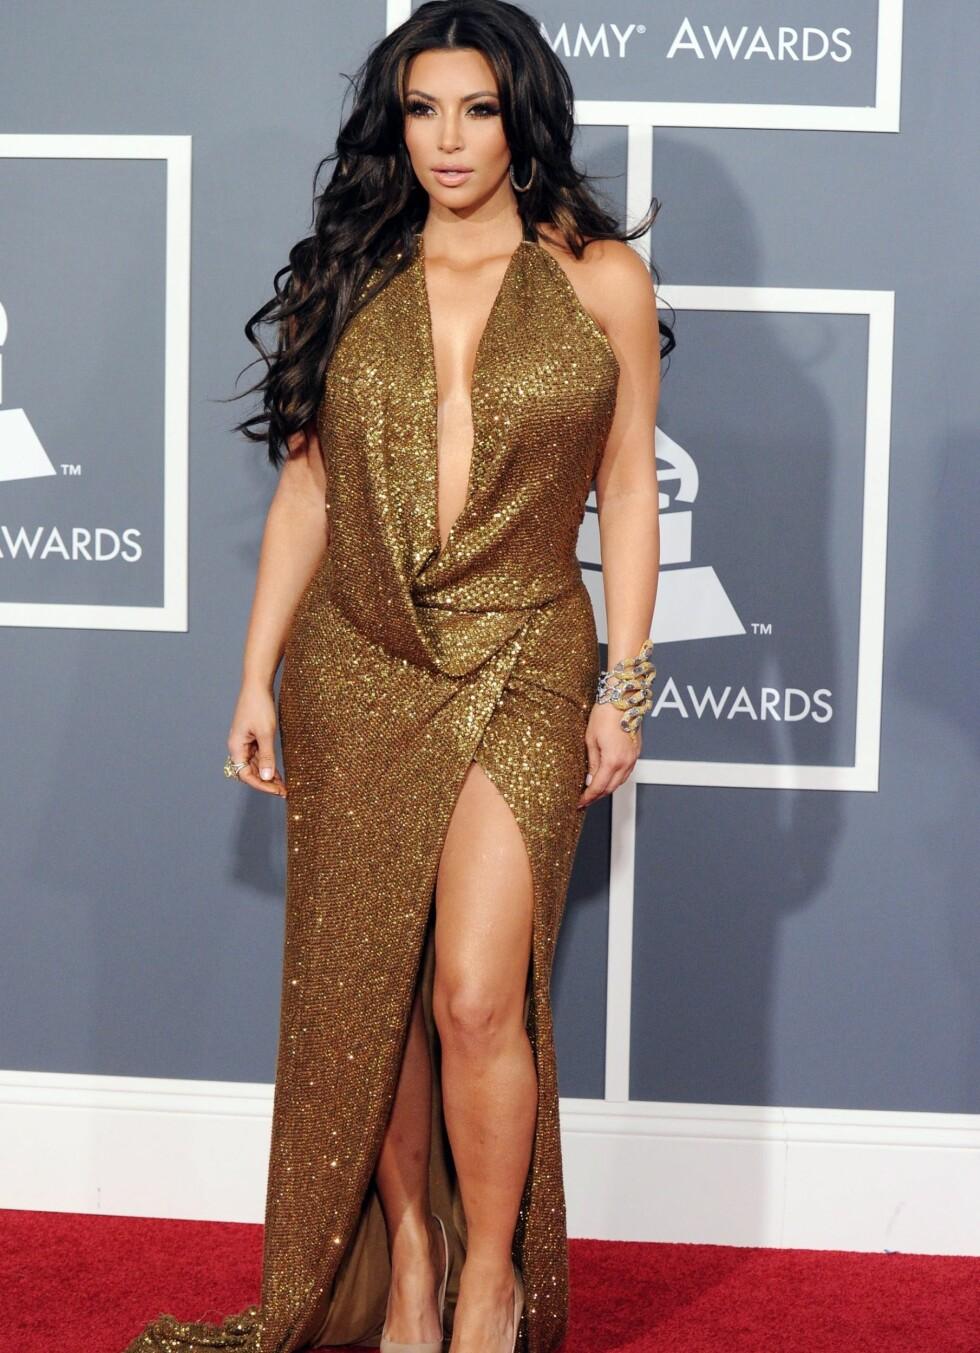 Tv-stjernen Kim Kardashian i gullkjole fra Kaufman Franco.  Foto: All Over Press